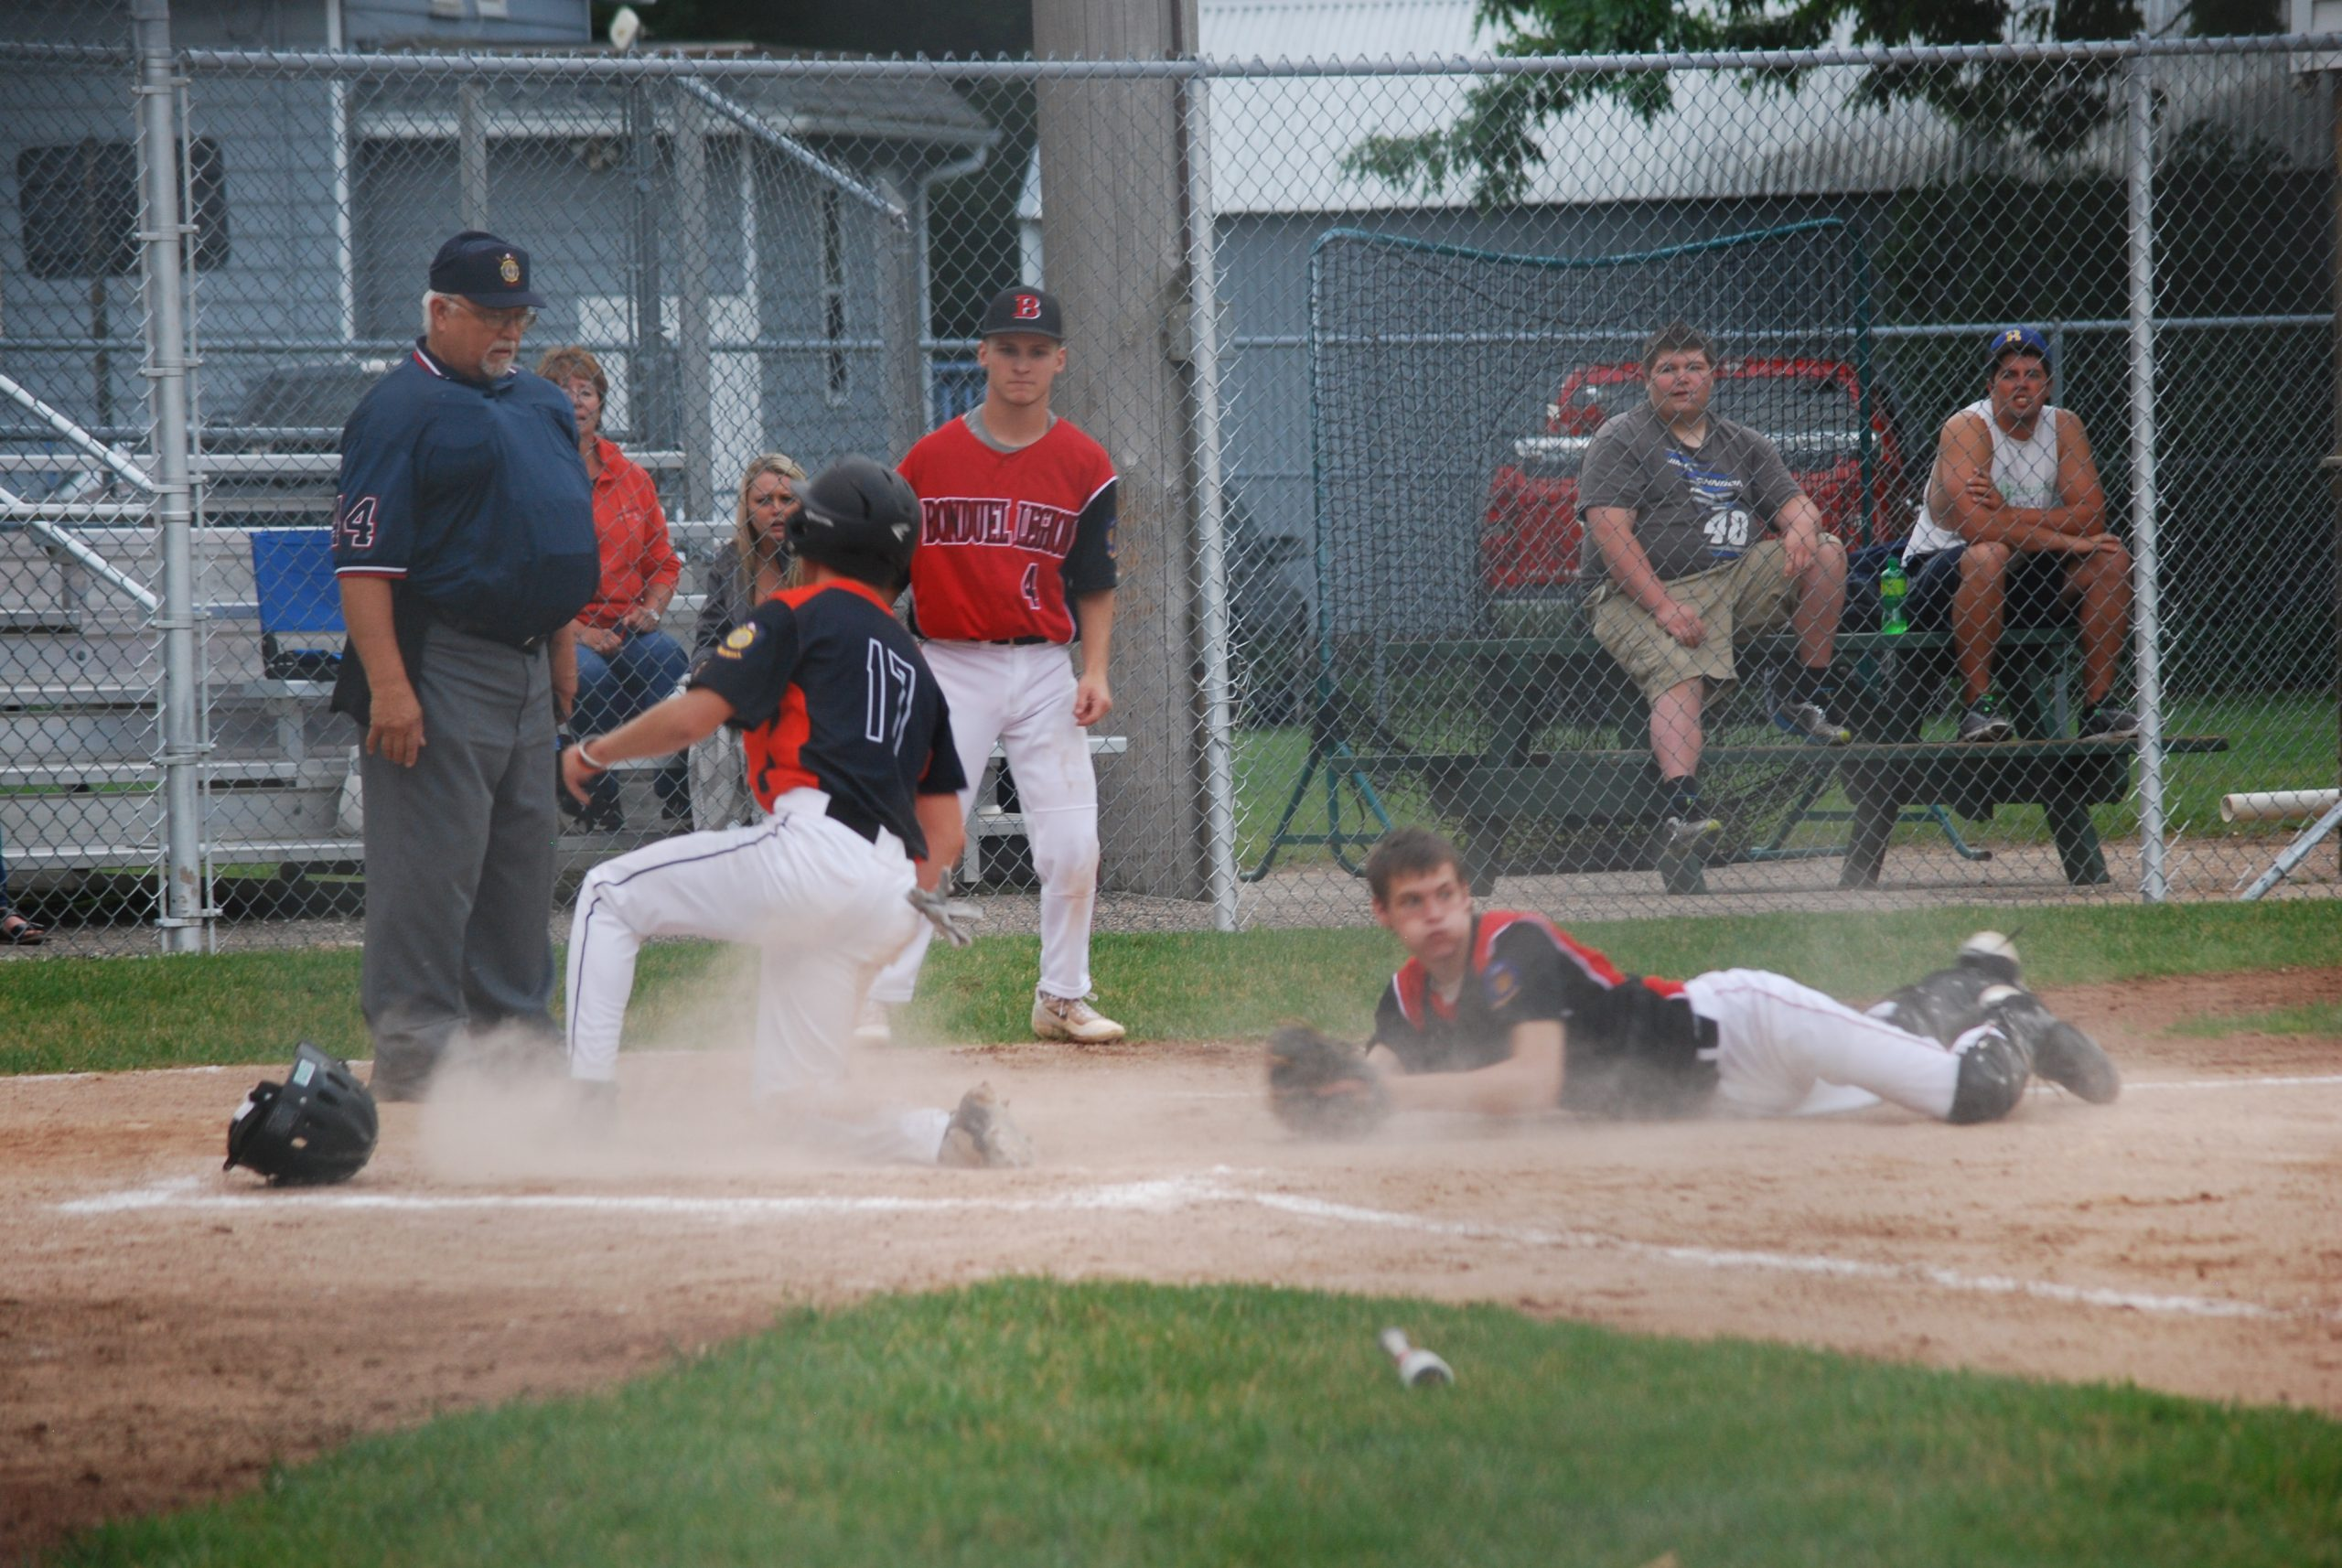 Legion Baseball: Vollmer dominant as Clintonville shuts out Bonduel